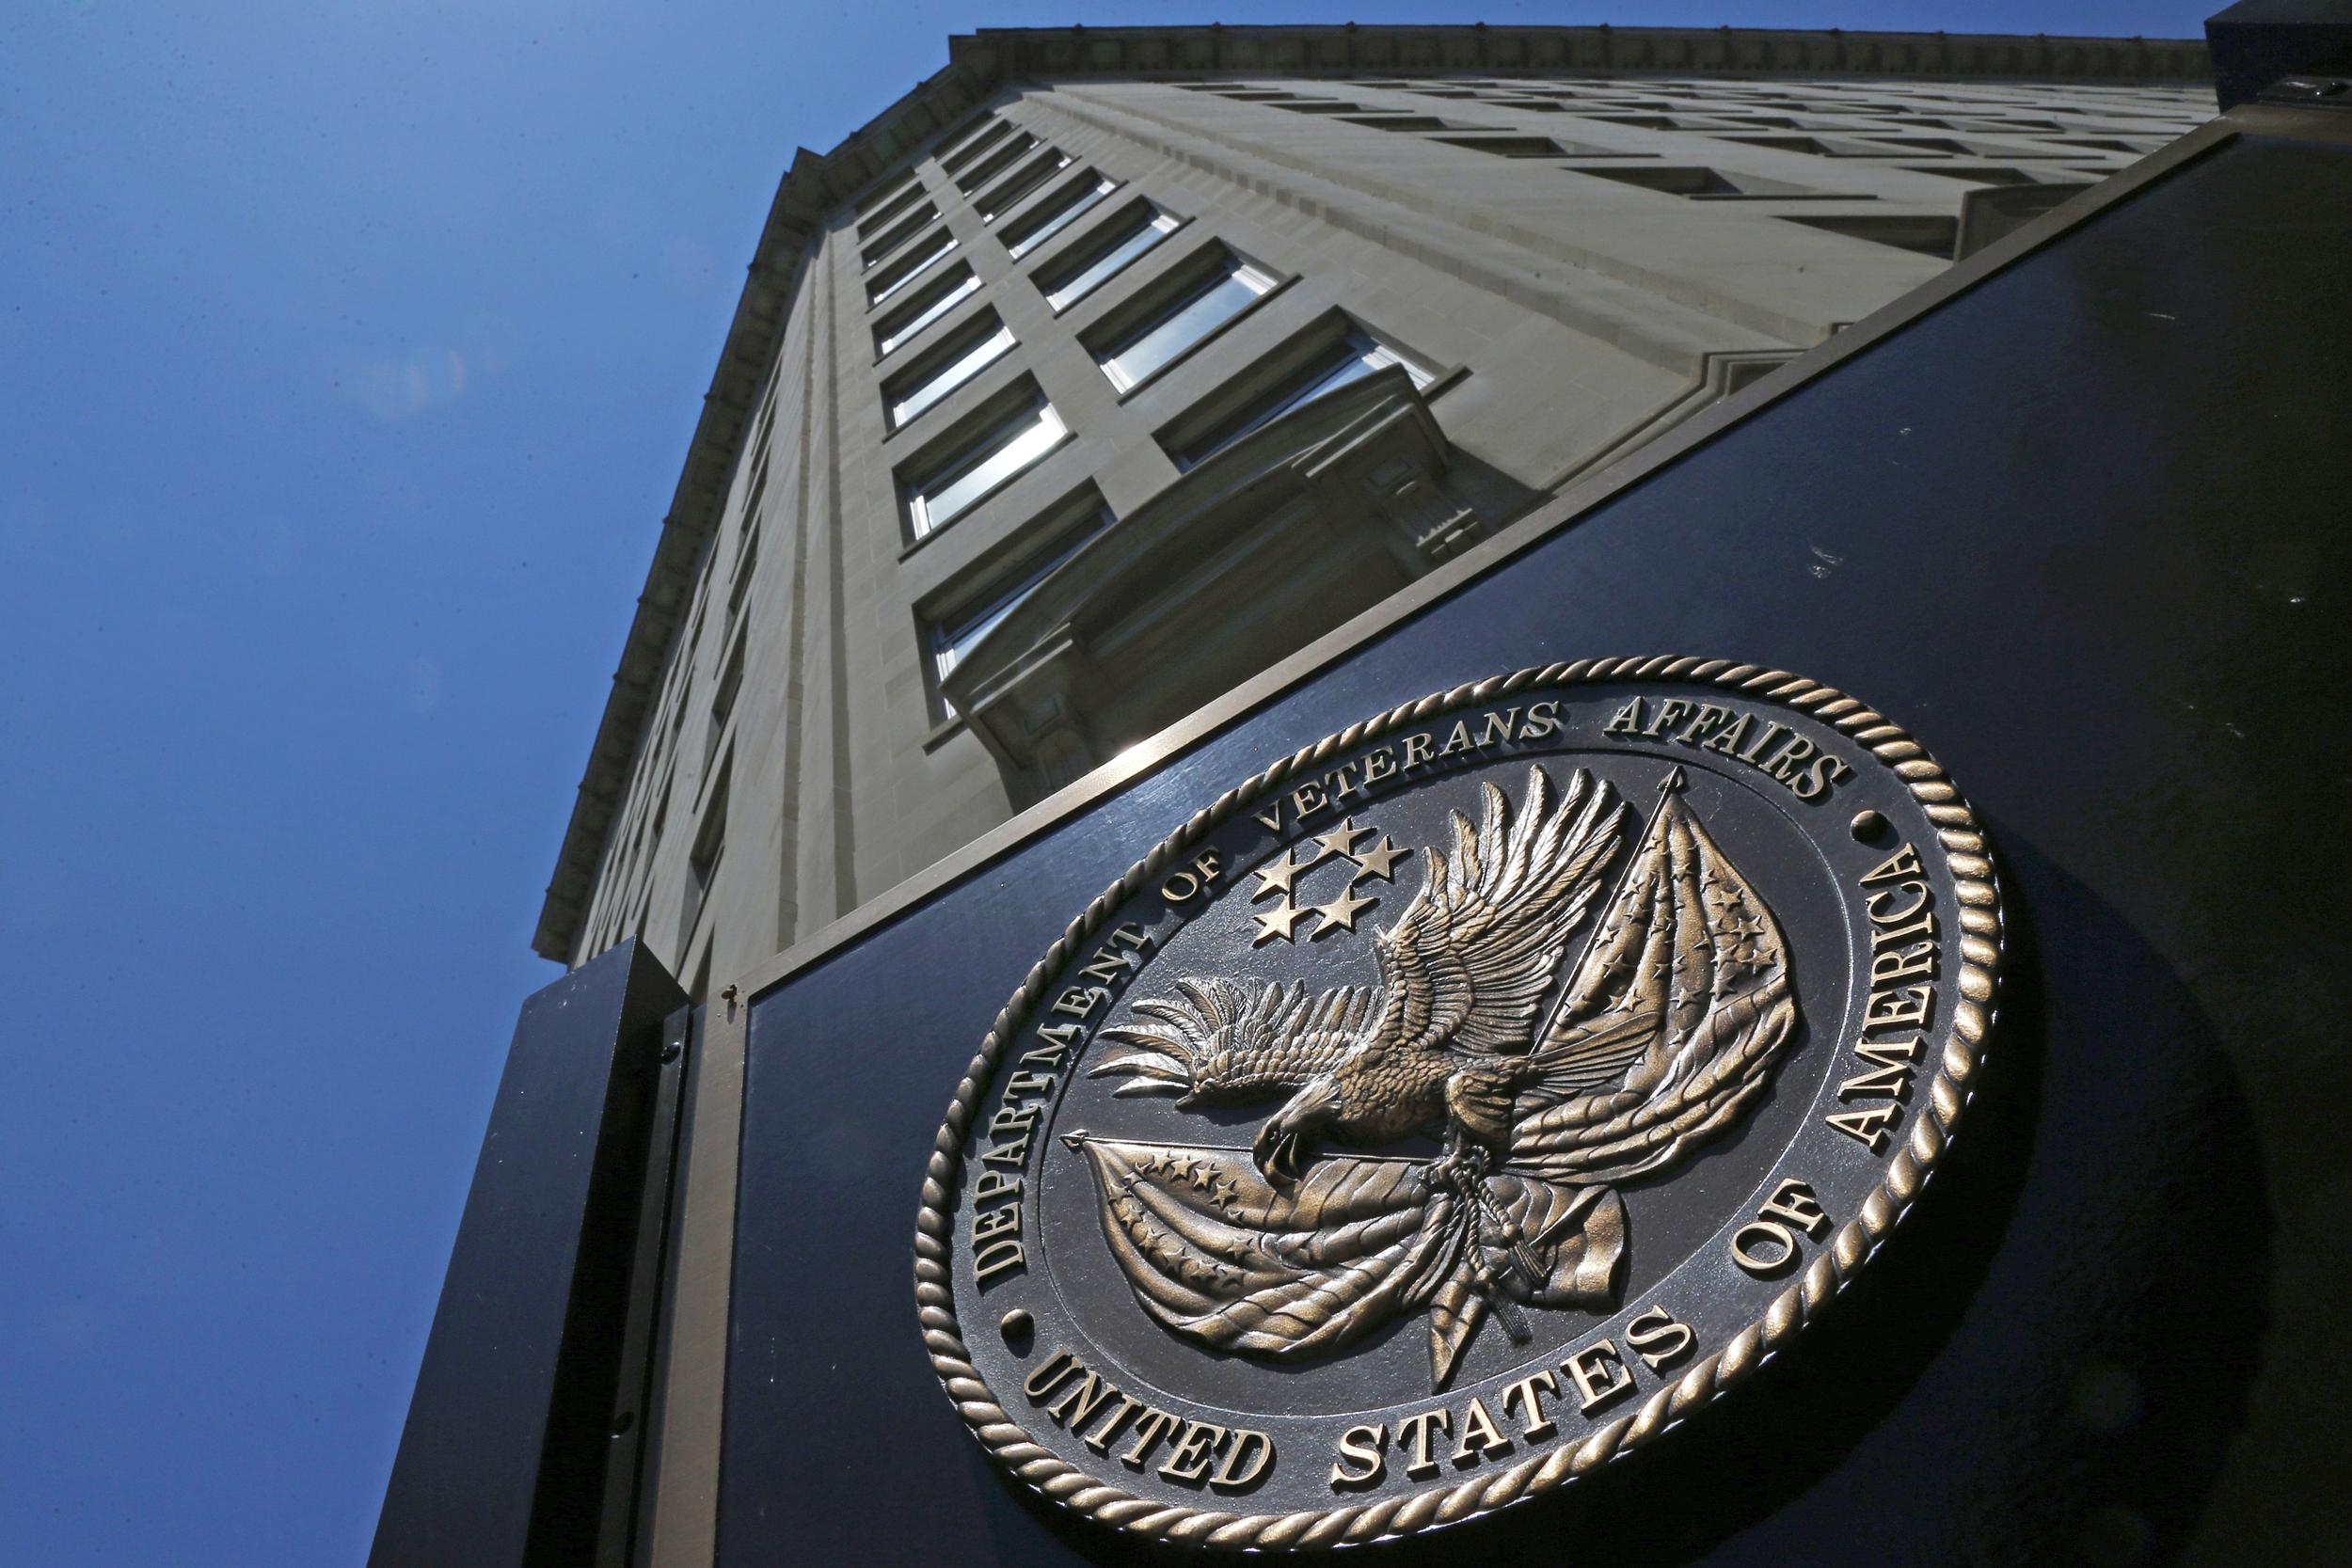 Missing Drugs Prompts Probe of VA Hospitals Staff